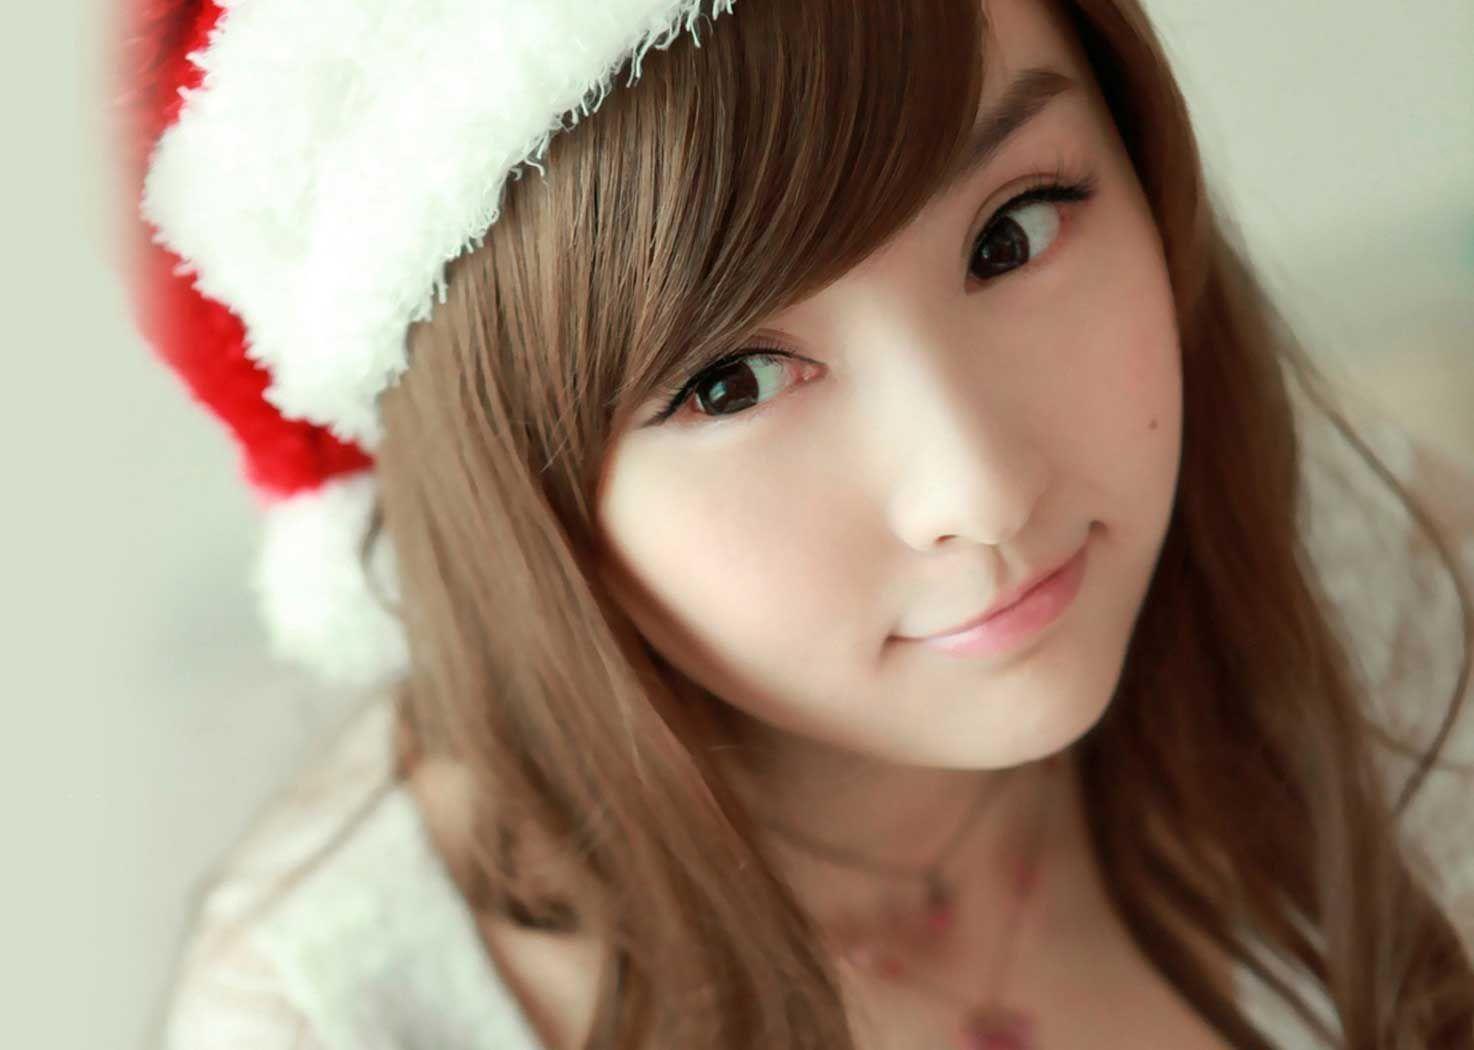 cutest christmas girls profile dp for whatsapp - freshmorningquotes